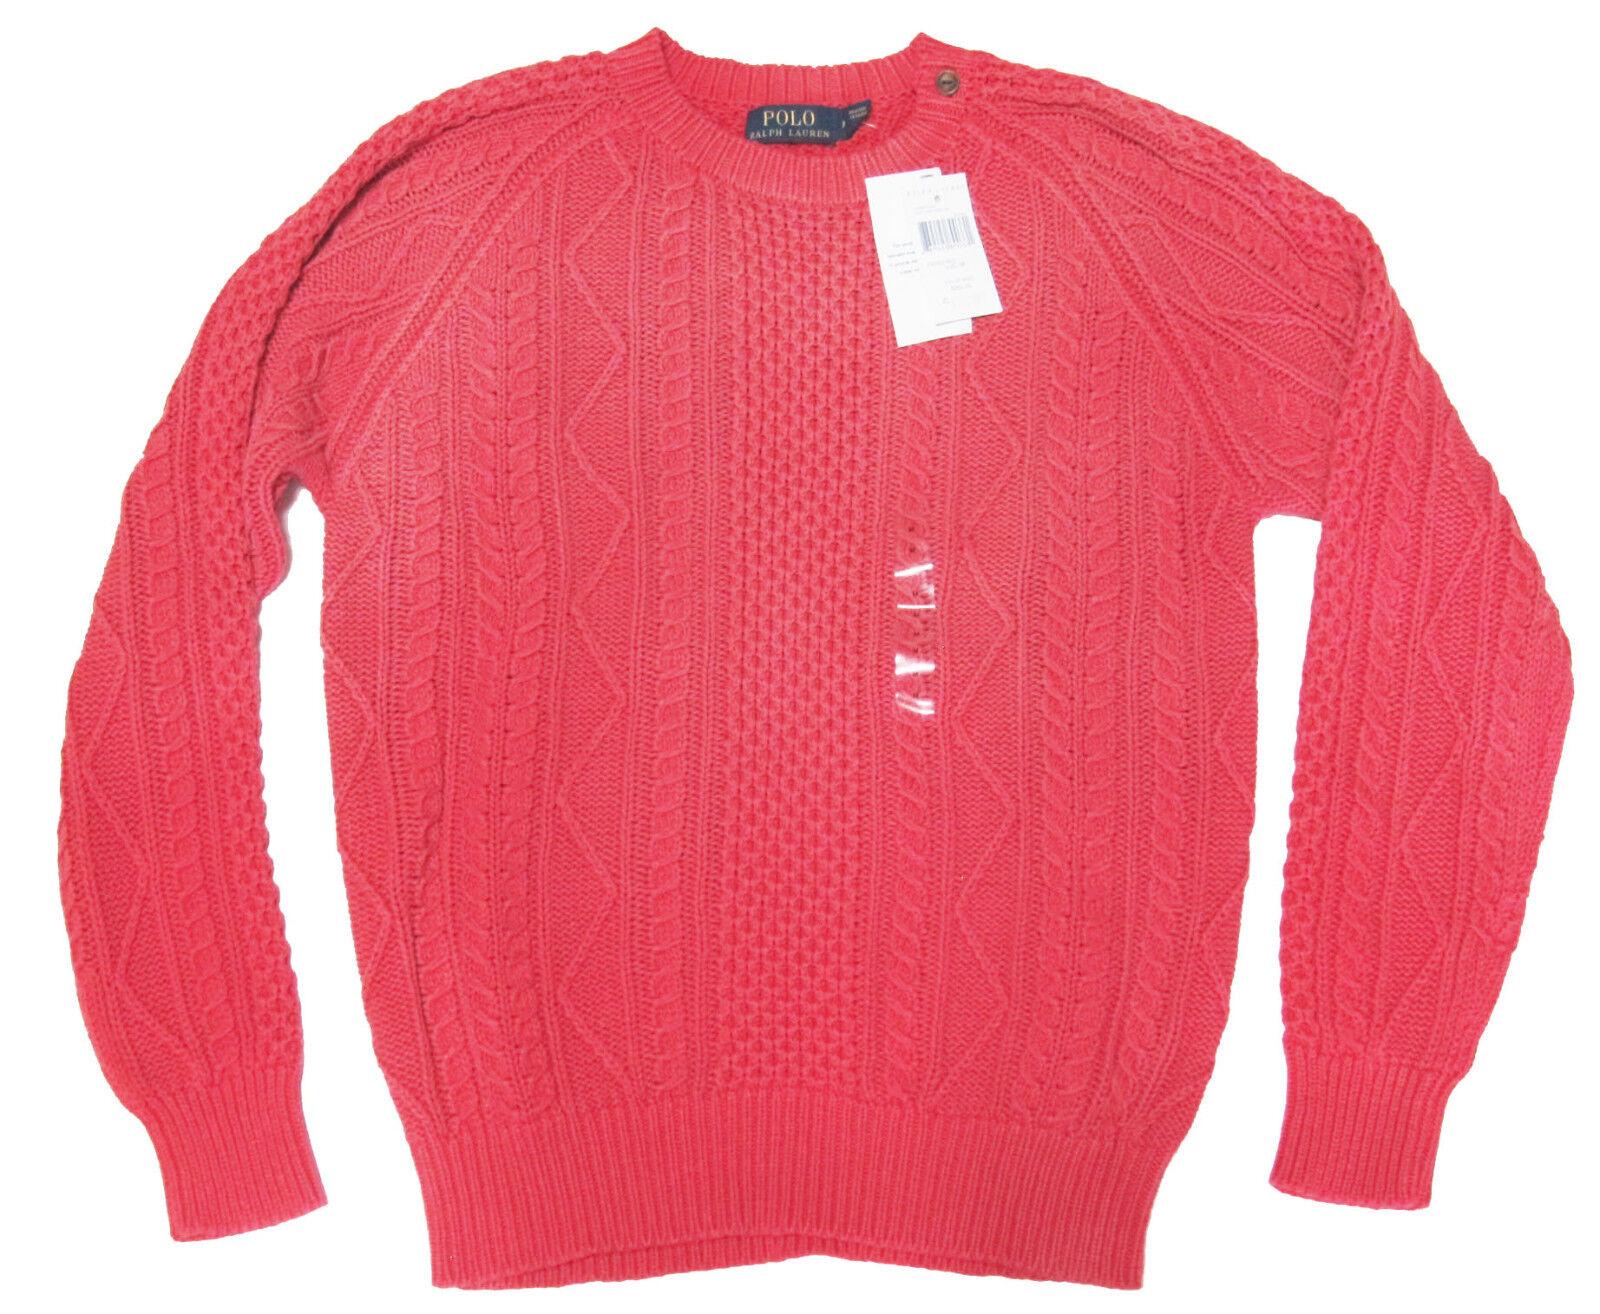 265 Polo Ralph Lauren  Herren Sun Faded ROT Cable Knit Seafarer Sailing Sweater